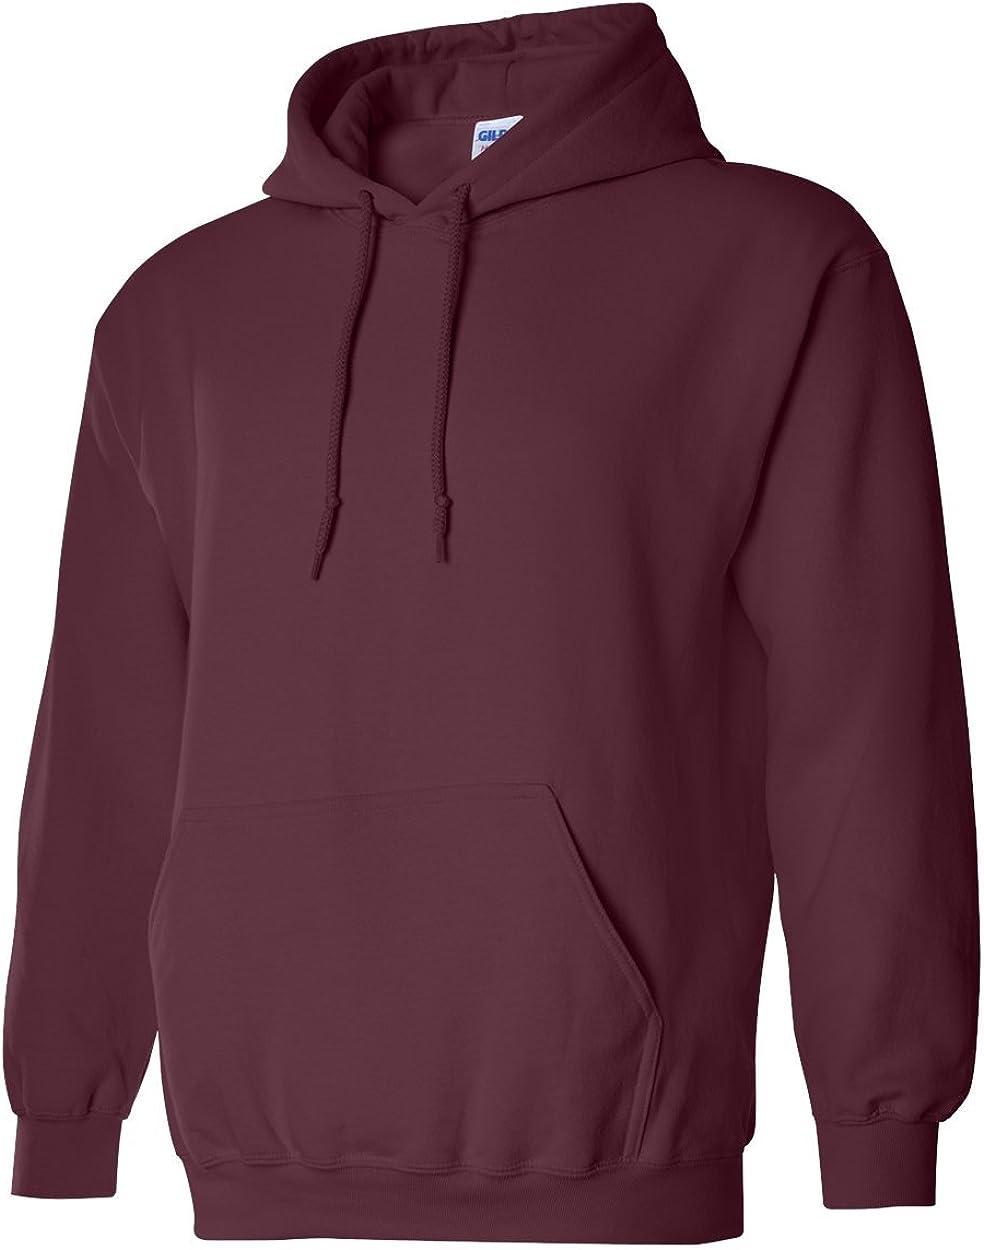 IF Cherri Cant FIX IT NO ONE CAN Hoodie Shirt Premium Shirt Black